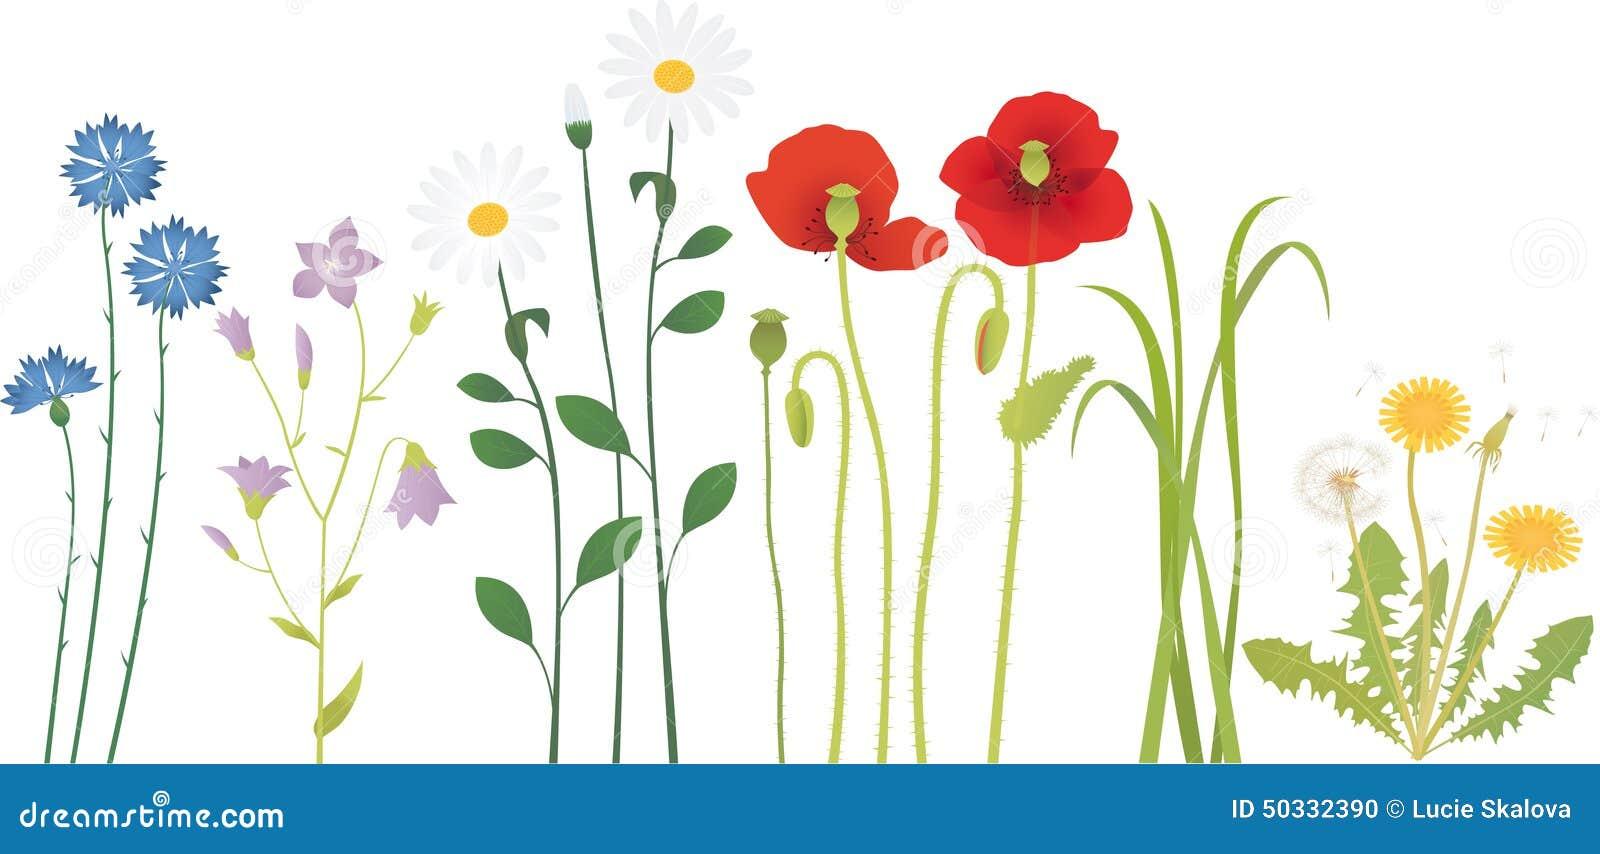 Meadow Flowers Stock Vector - Image: 50332390